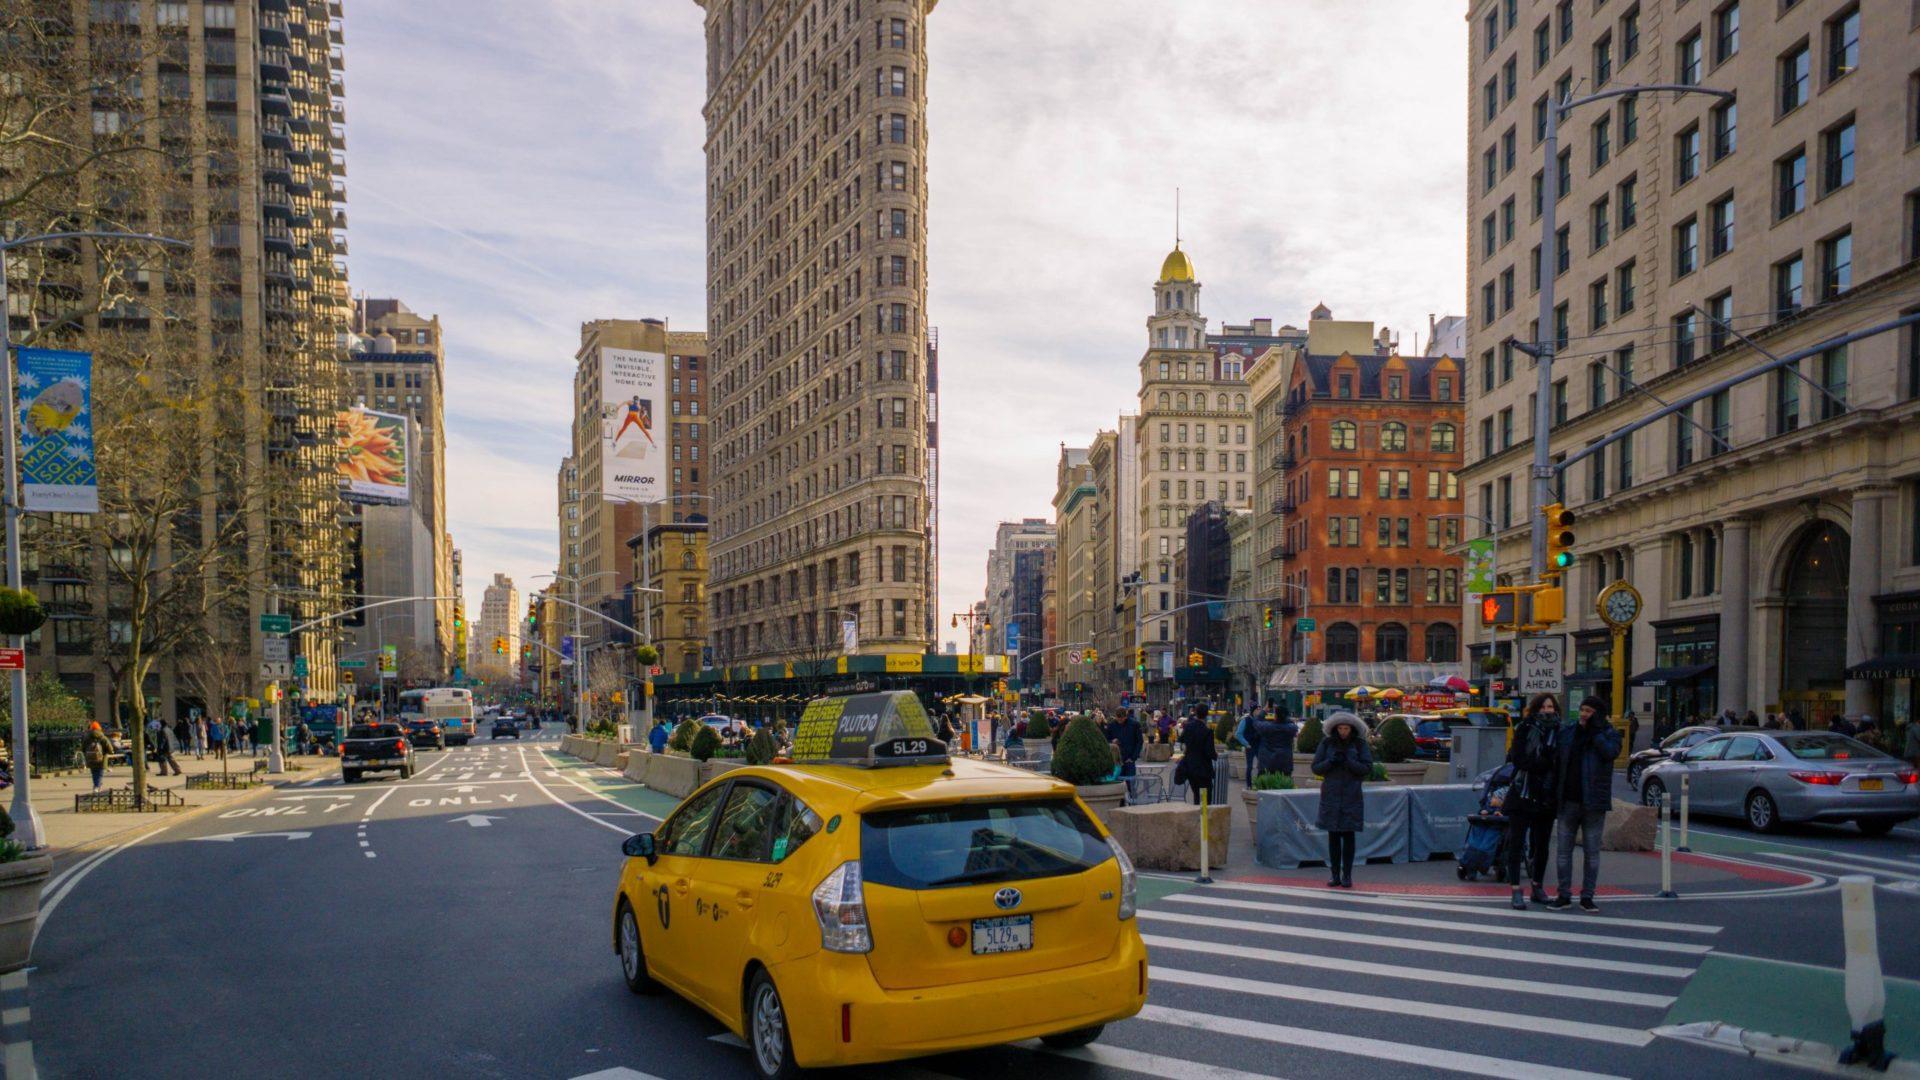 Flatiron Building in New York, USA